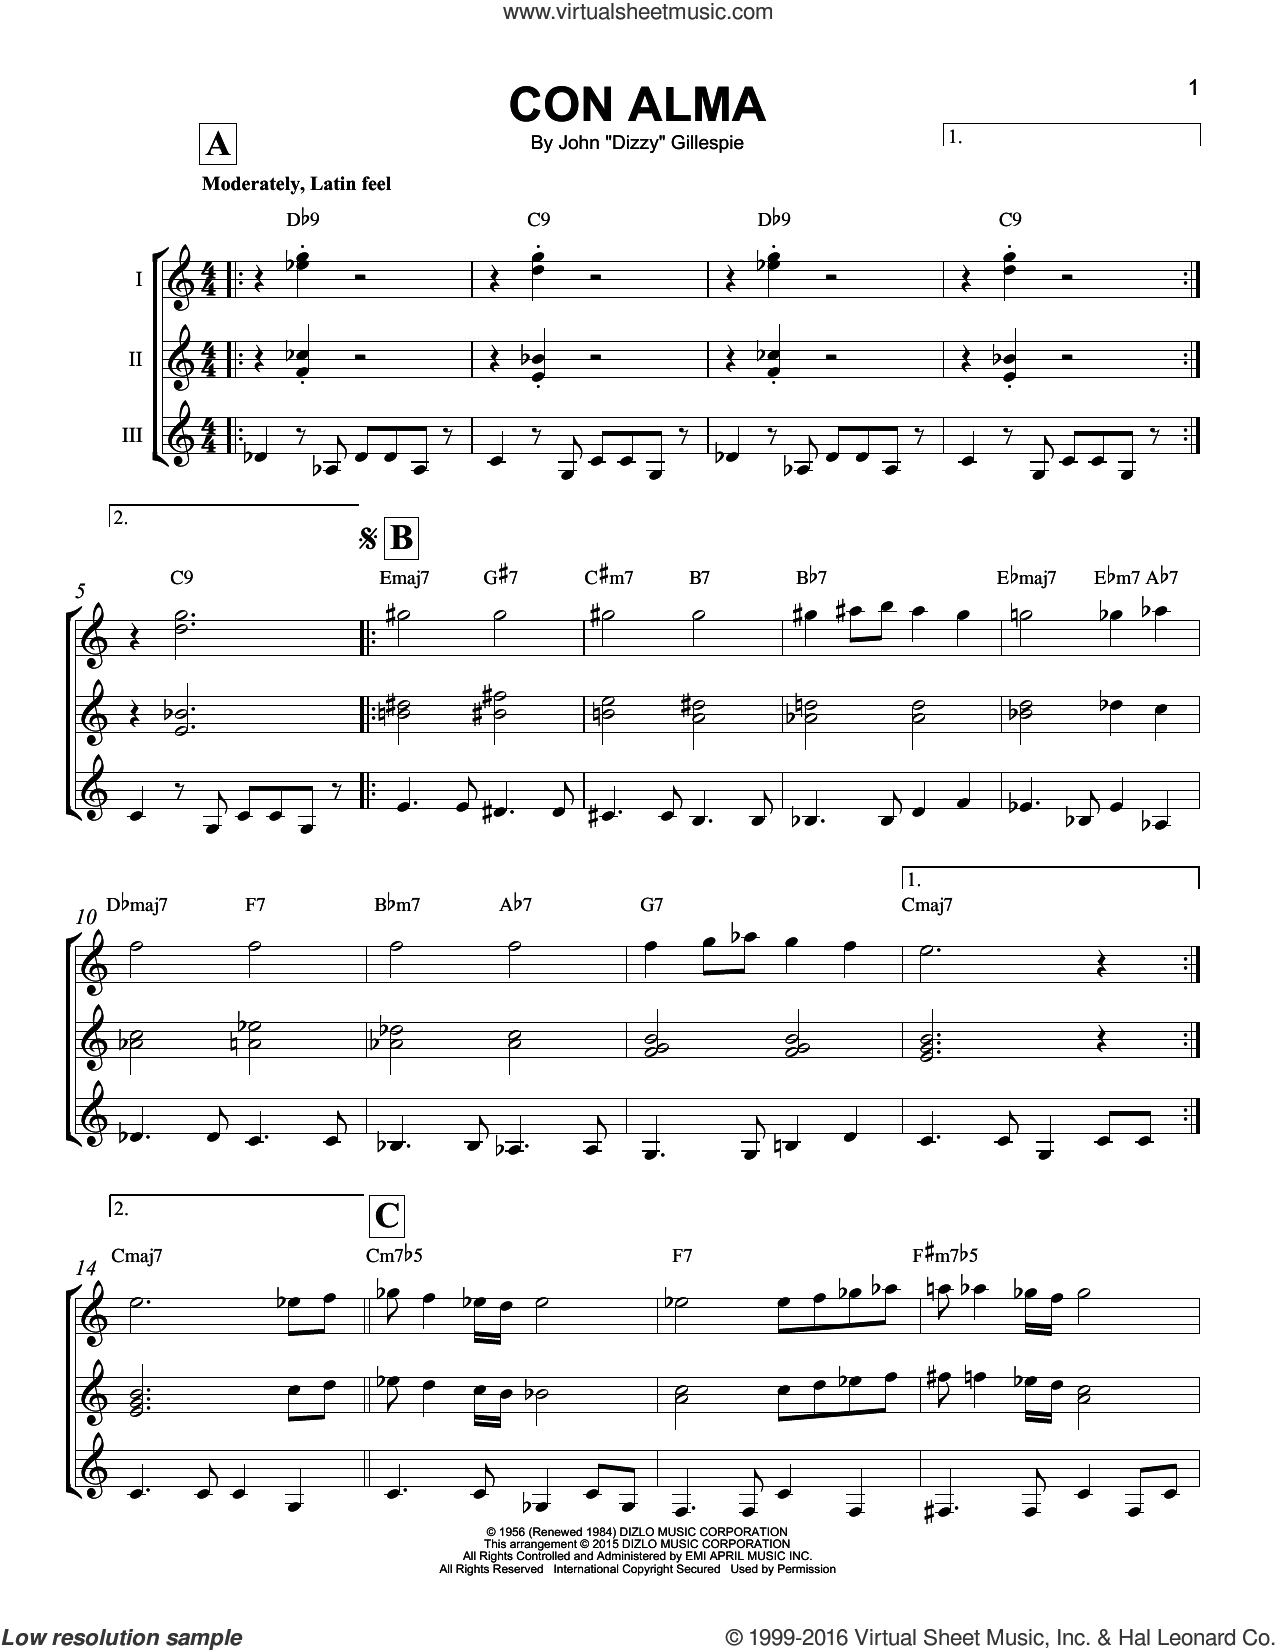 Con Alma sheet music for guitar ensemble by Dizzy Gillespie, intermediate skill level